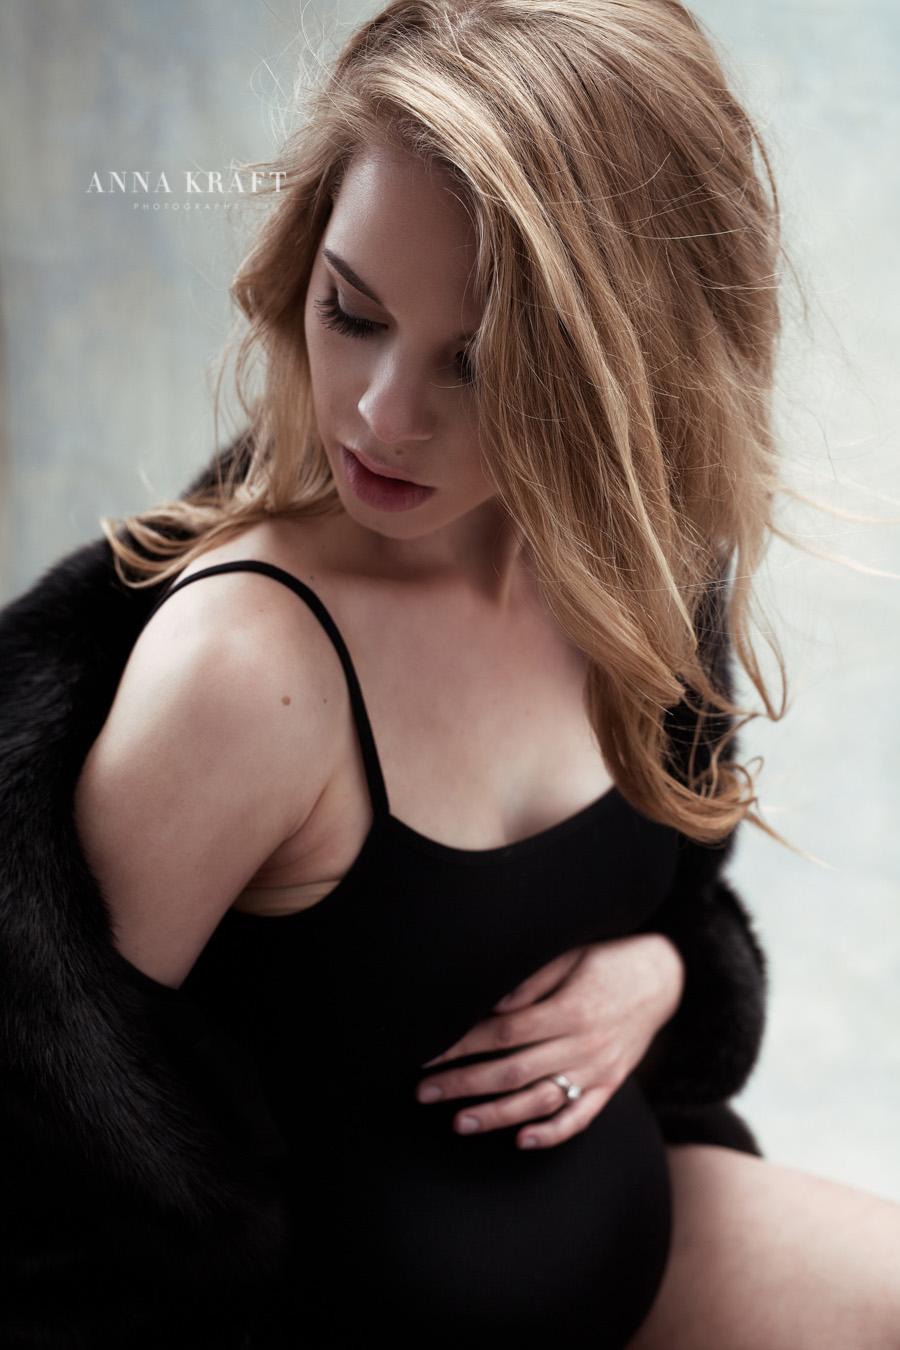 anna_kraft_photography_georgetown_square_studio_maternity_photo-27.jpg